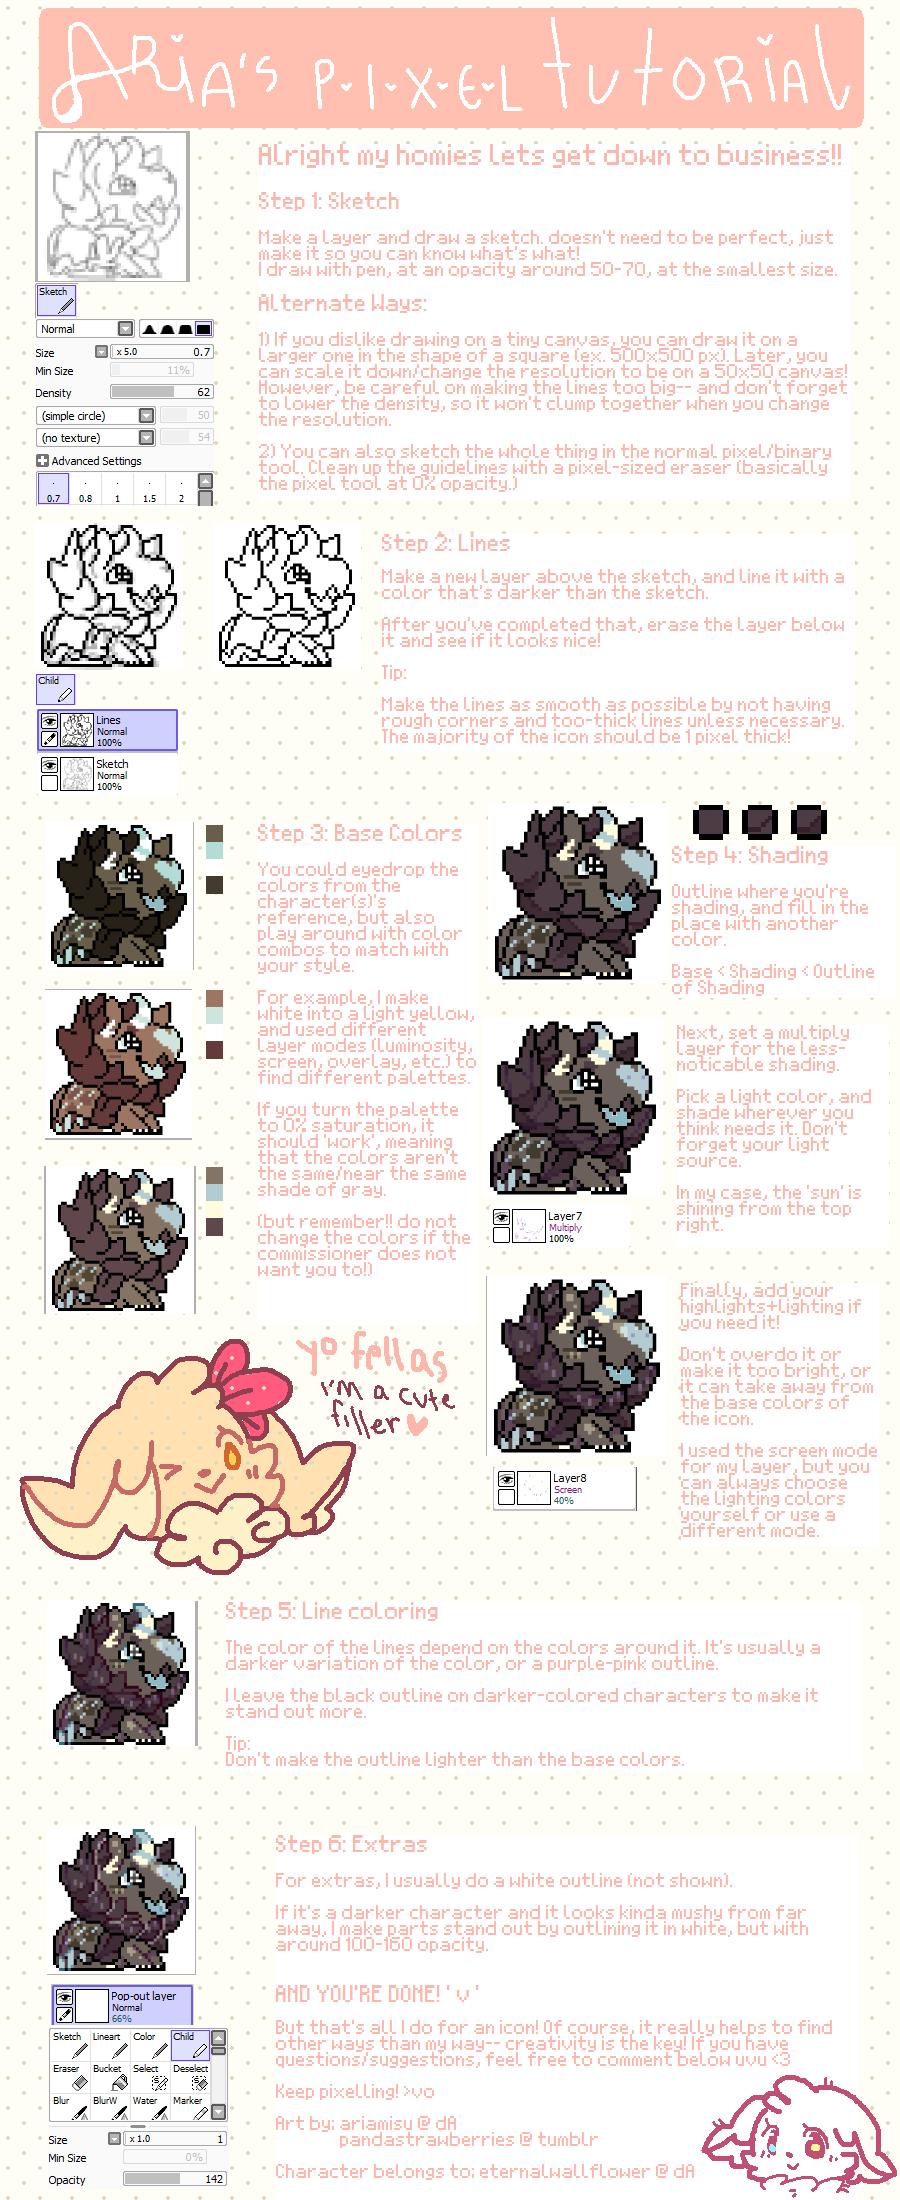 Aria's Pixel Tutorial! by ariamisu